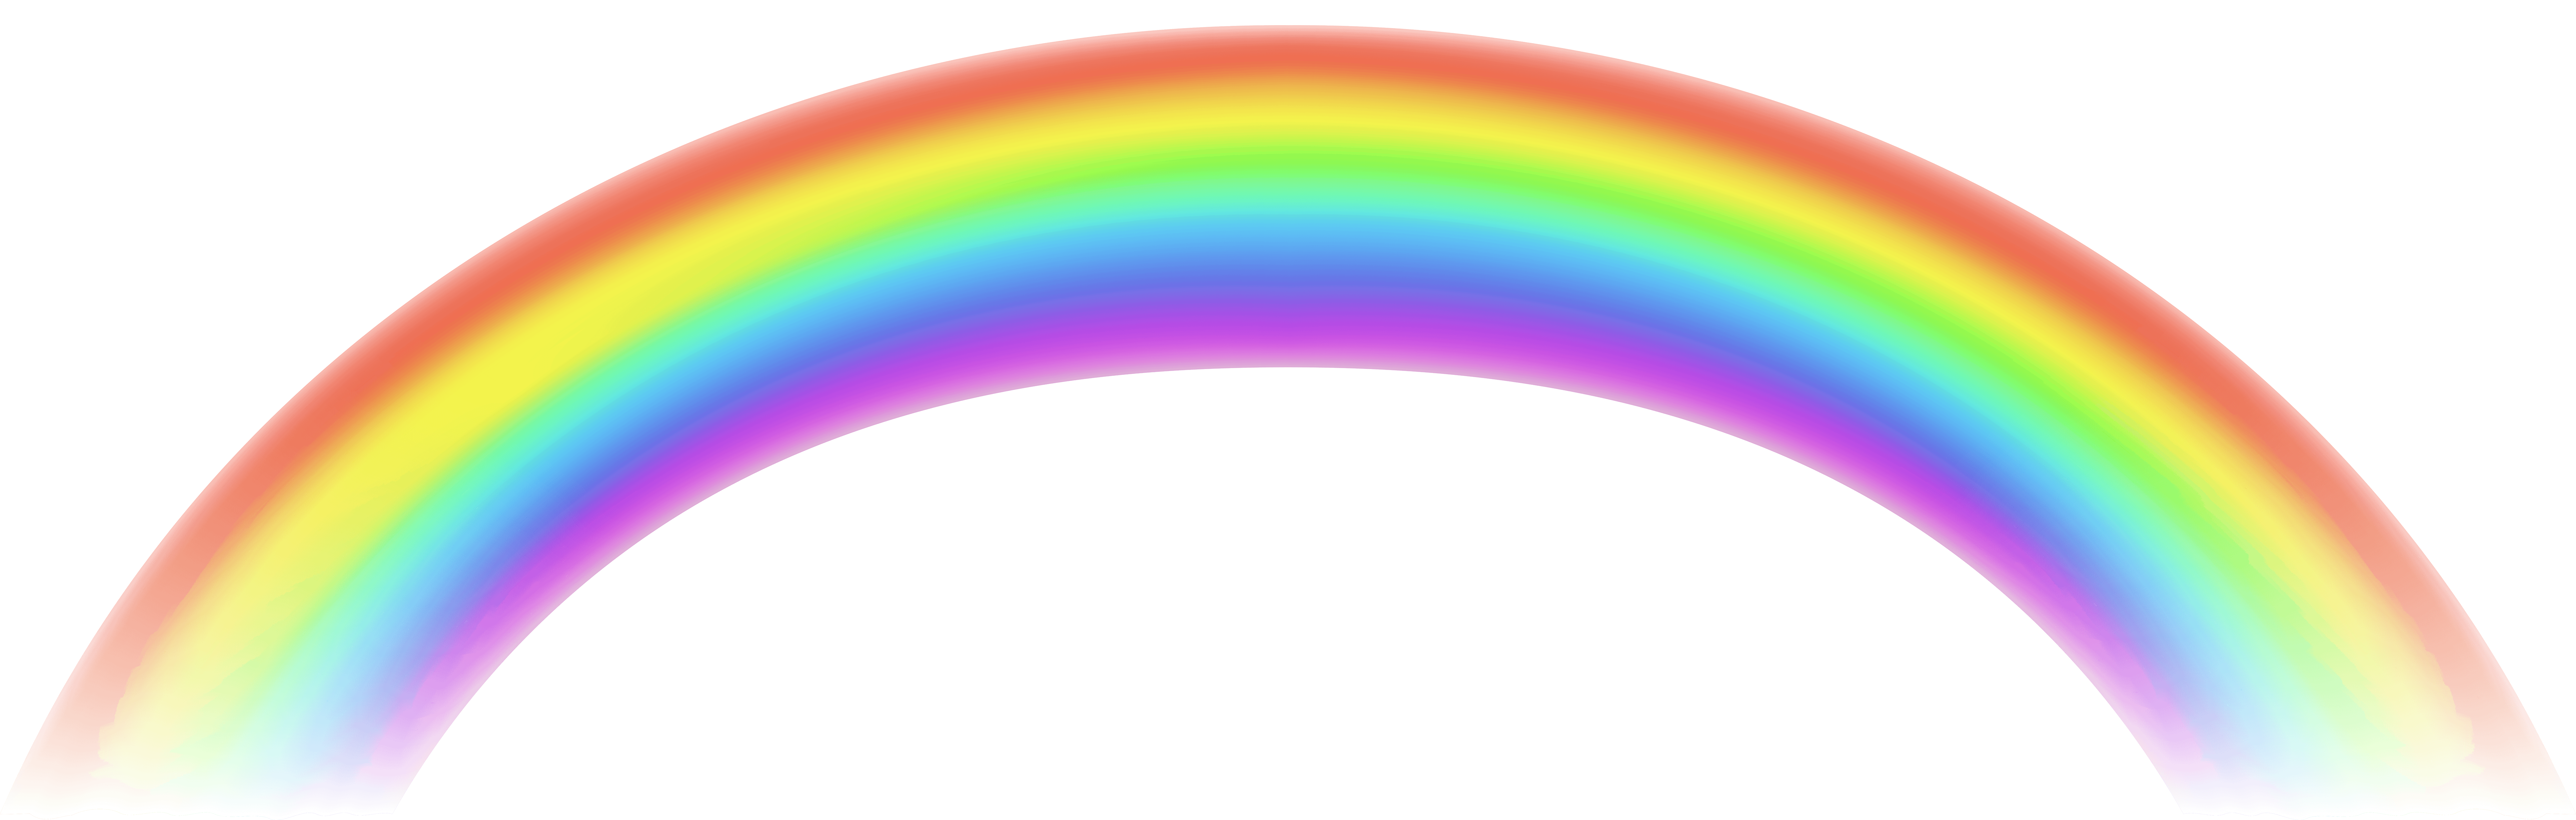 Transparent background rainbow clipart picture Free Transparent Rainbow Cliparts, Download Free Clip Art ... picture